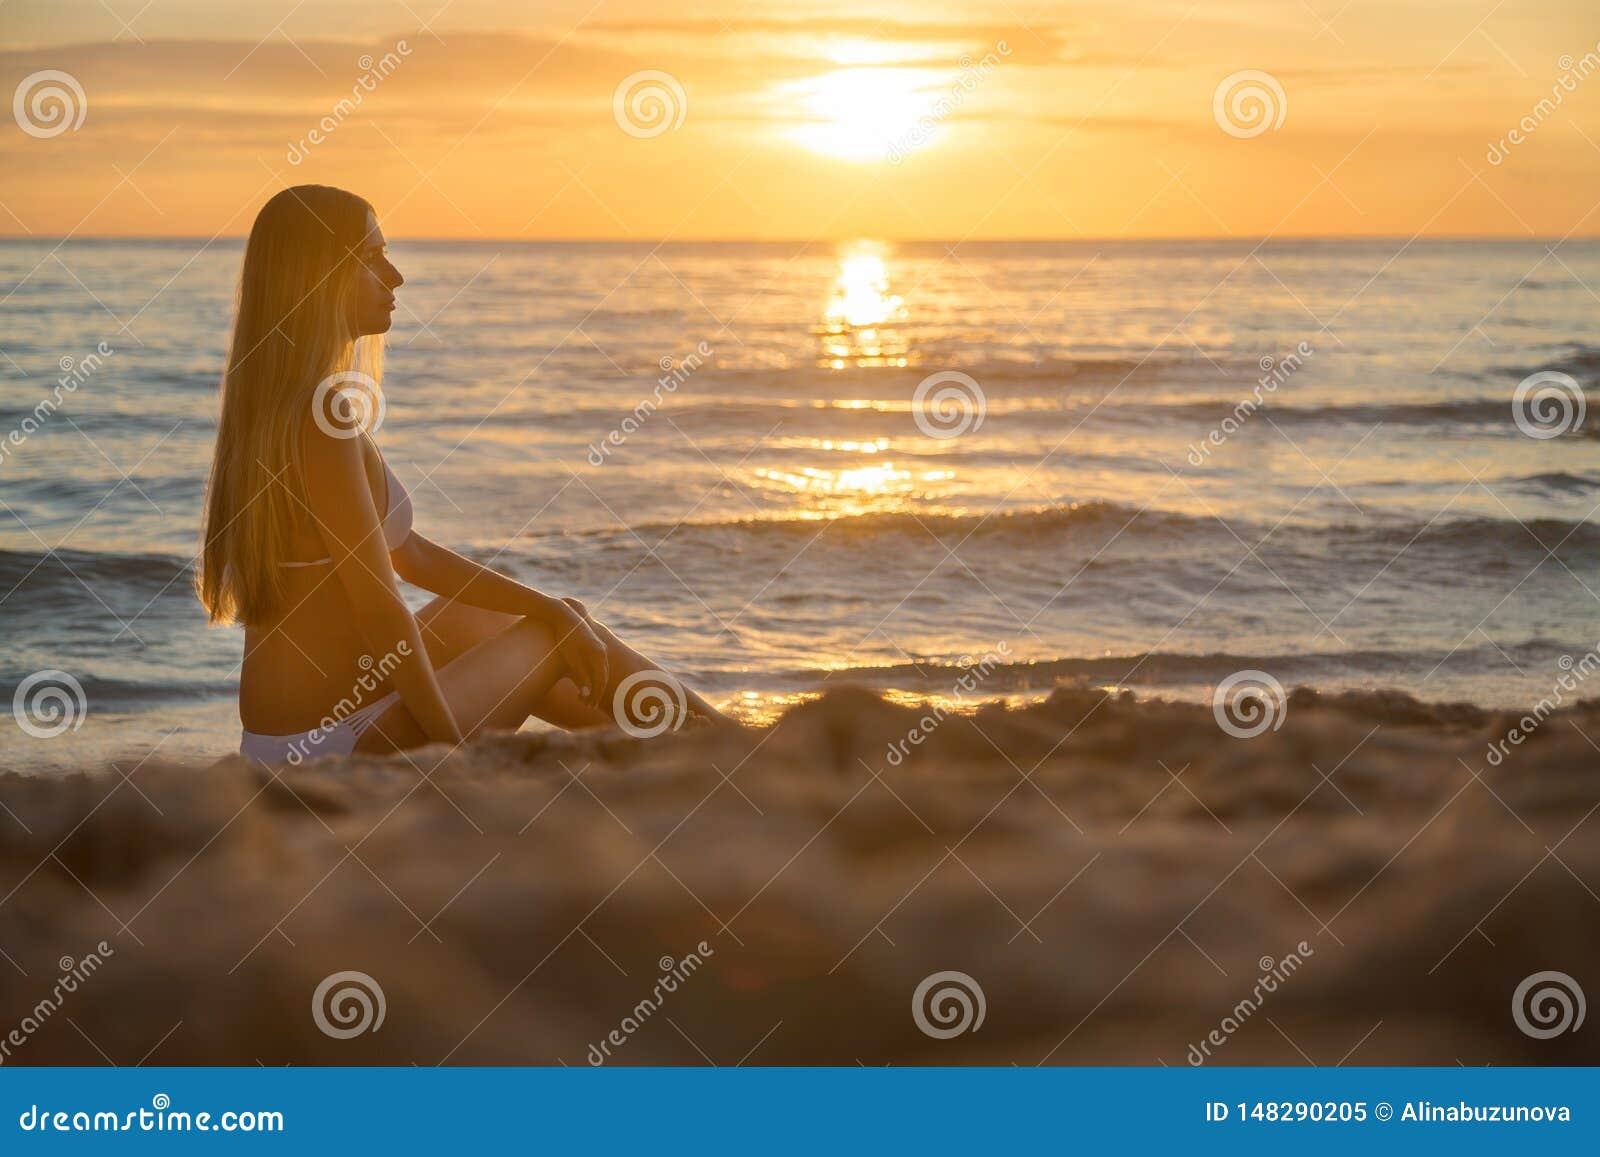 Manier openluchtfoto van sexy mooi meisje met blondehaar in het elegante witte bikini ontspannen op zonsondergangstrand